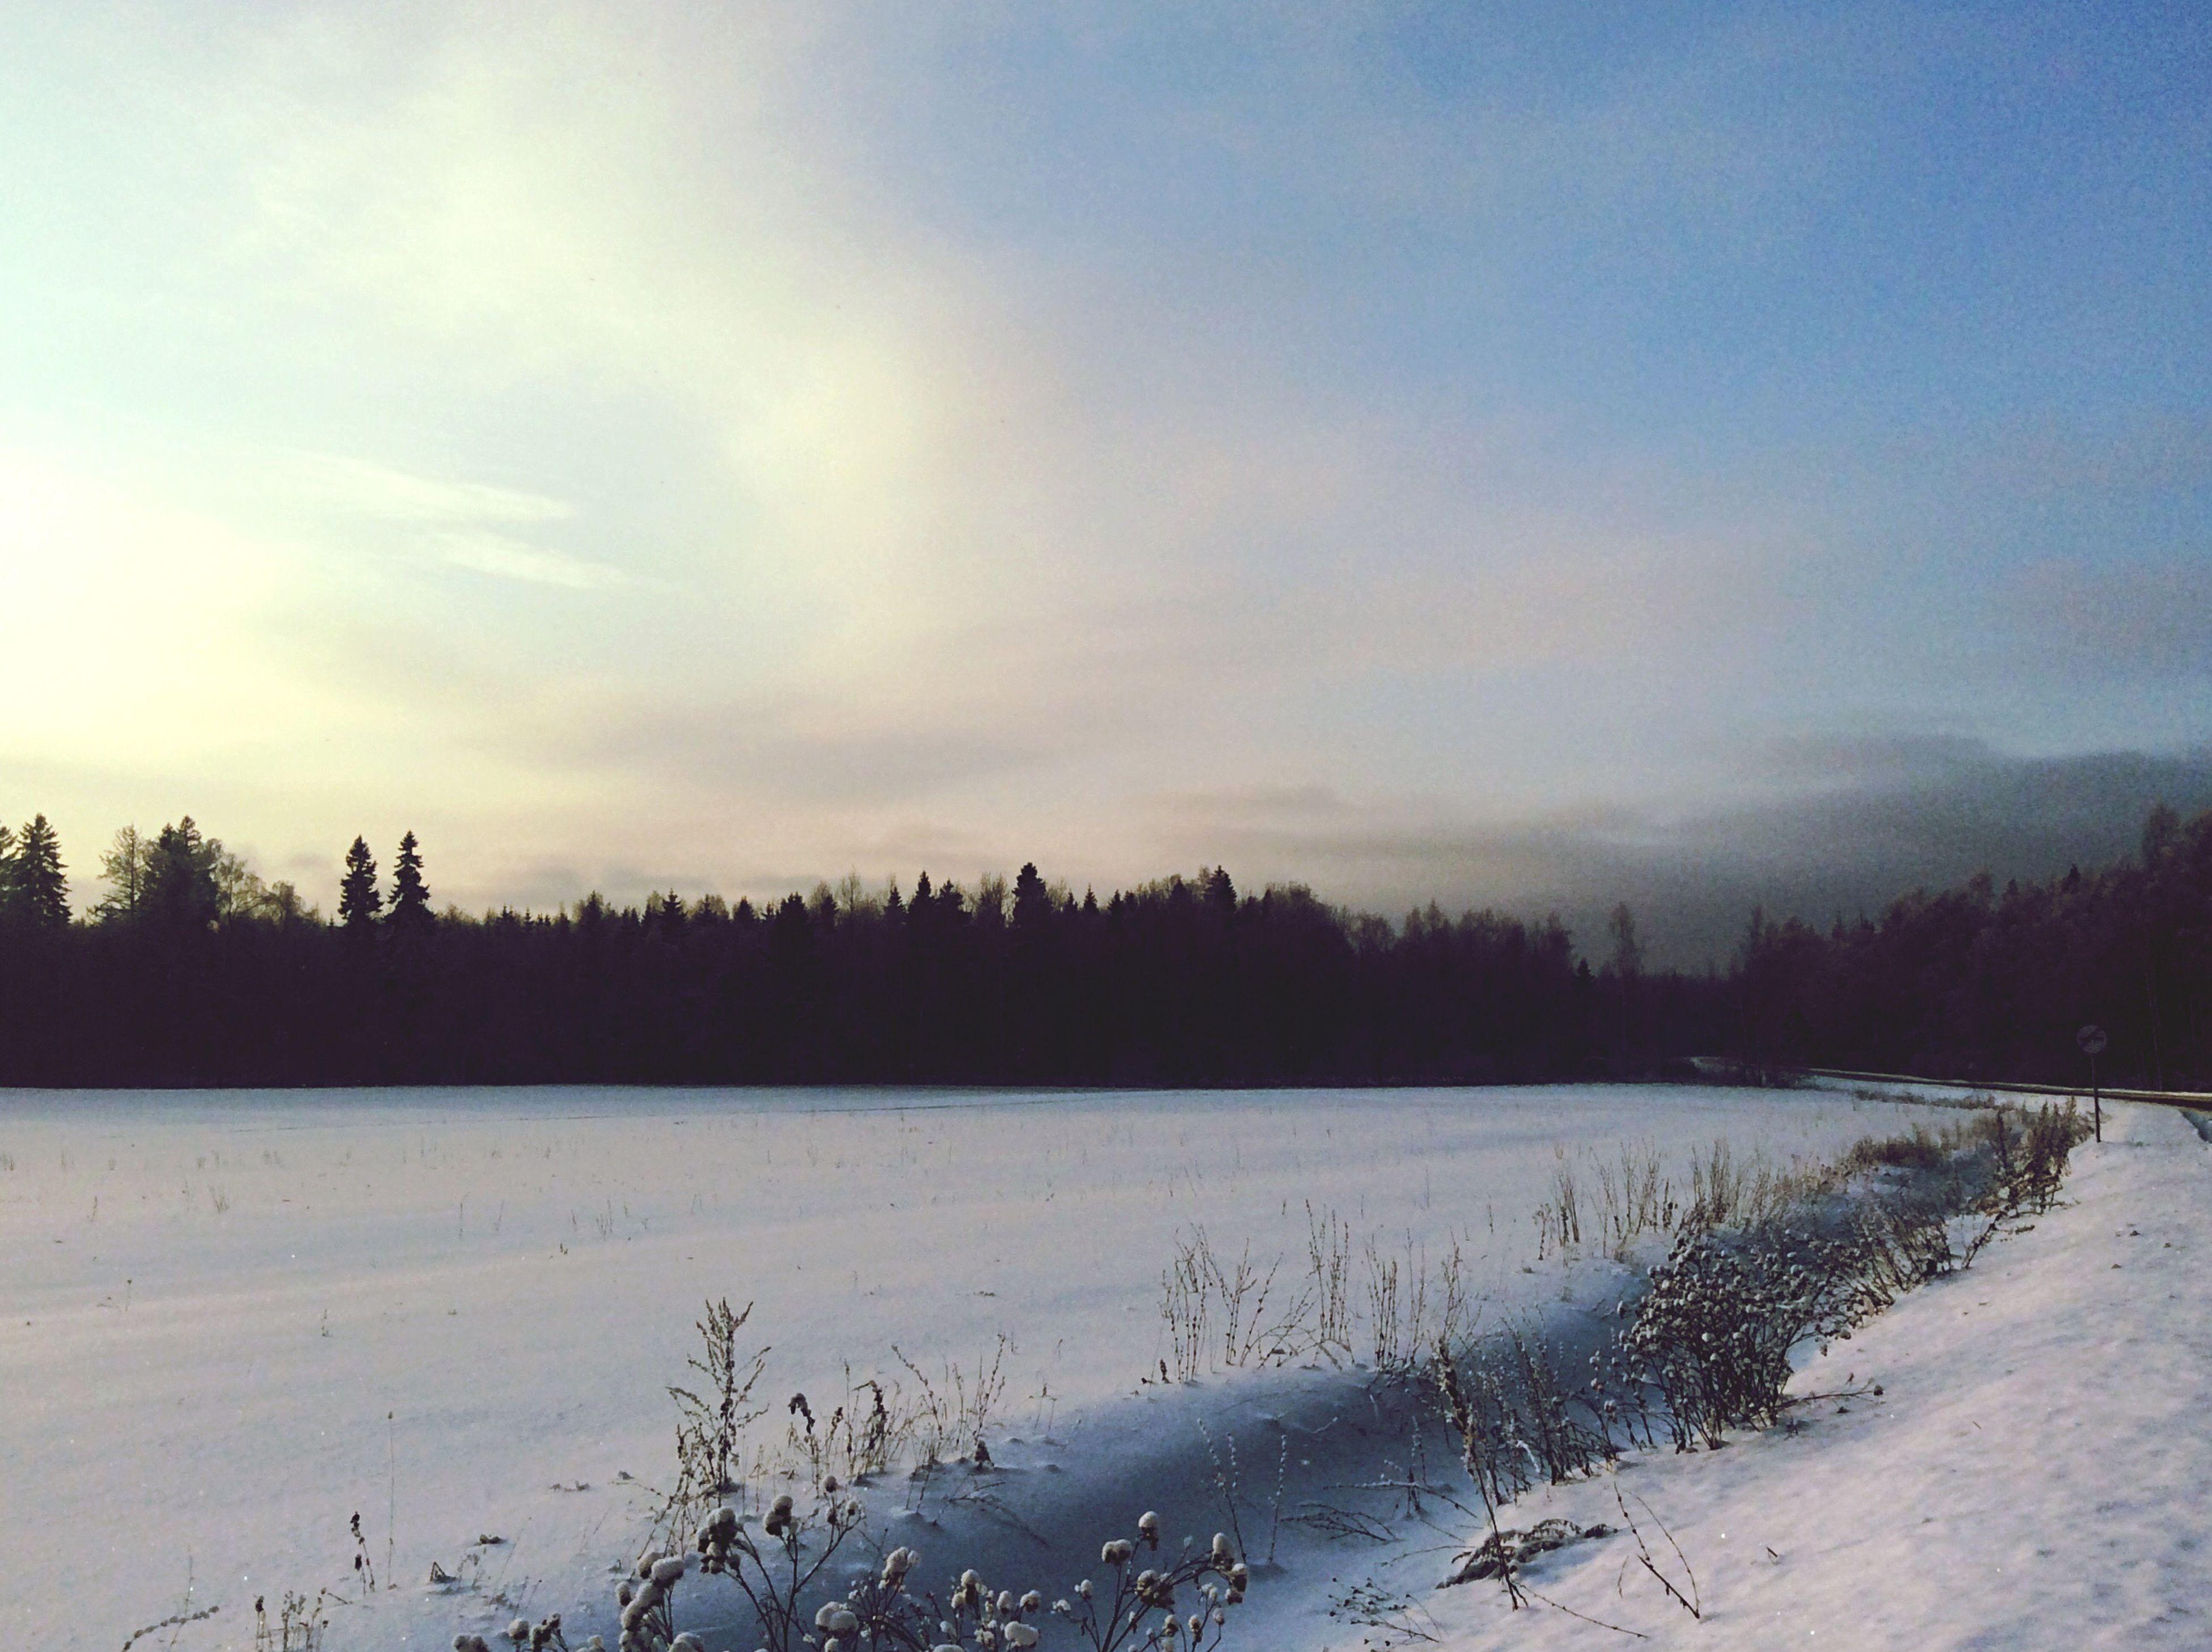 snow, winter, cold temperature, tranquil scene, tranquility, season, tree, weather, scenics, beauty in nature, landscape, sky, nature, covering, field, frozen, non-urban scene, bare tree, sunset, cloud - sky